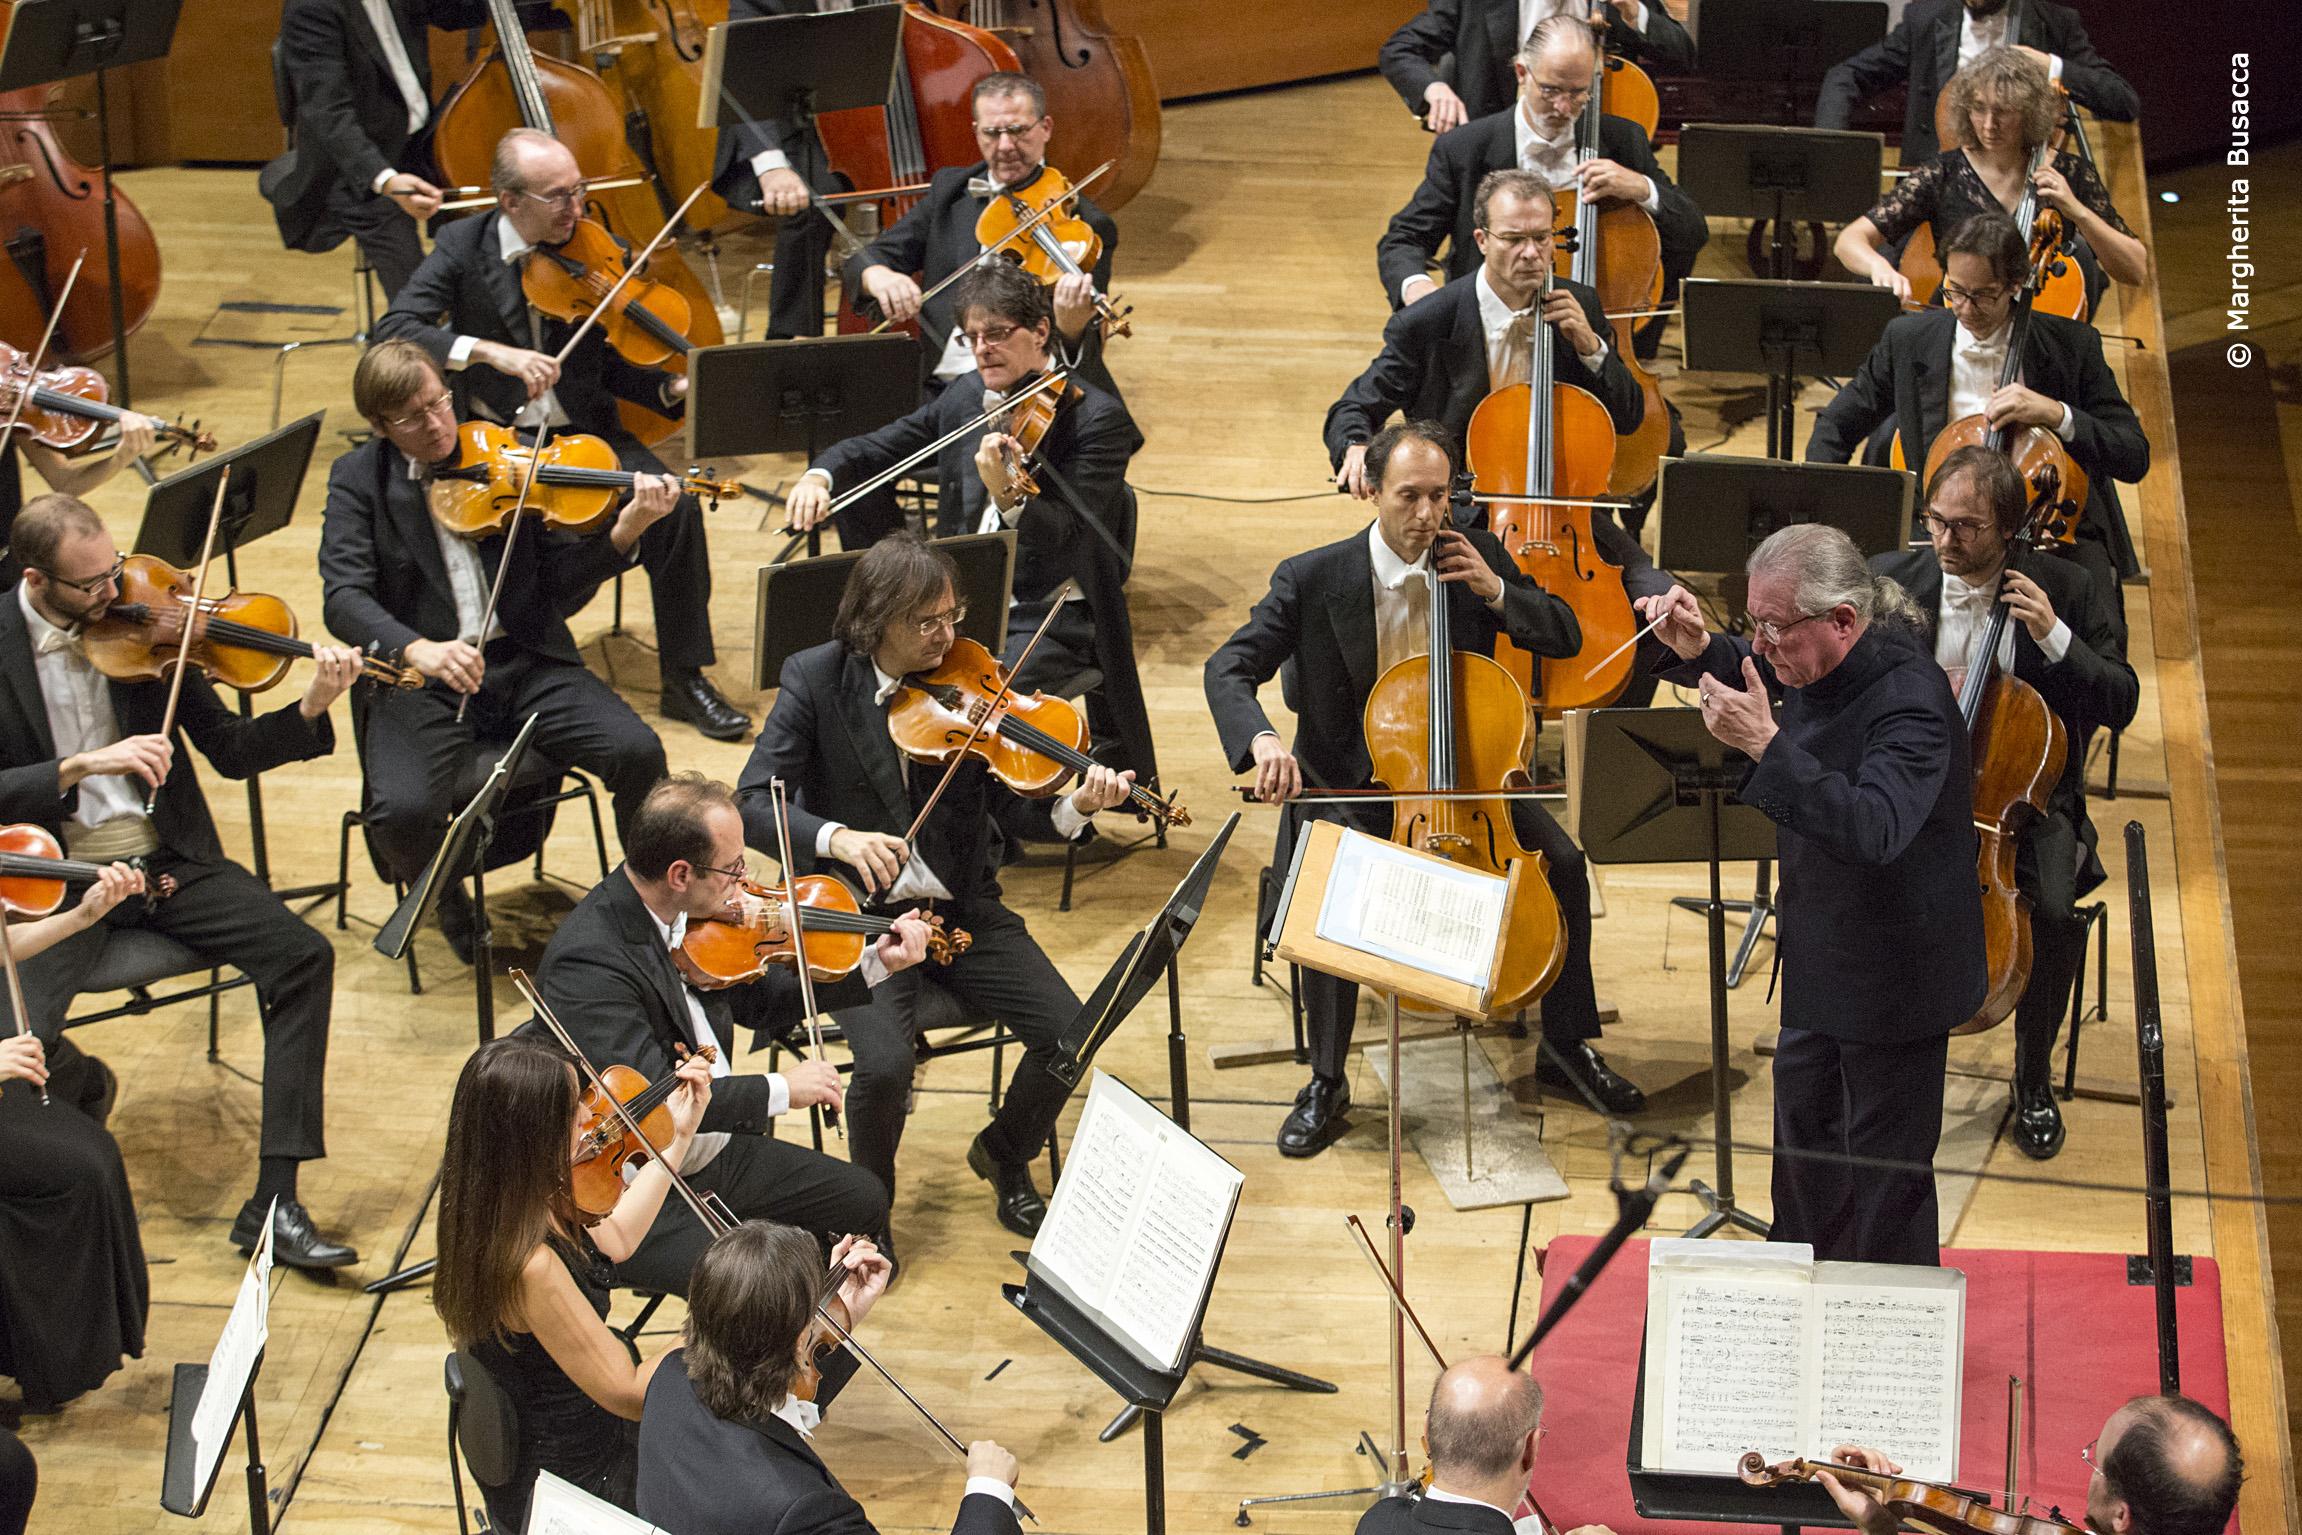 ph. Margherita Busacca - Festival Milano Musica